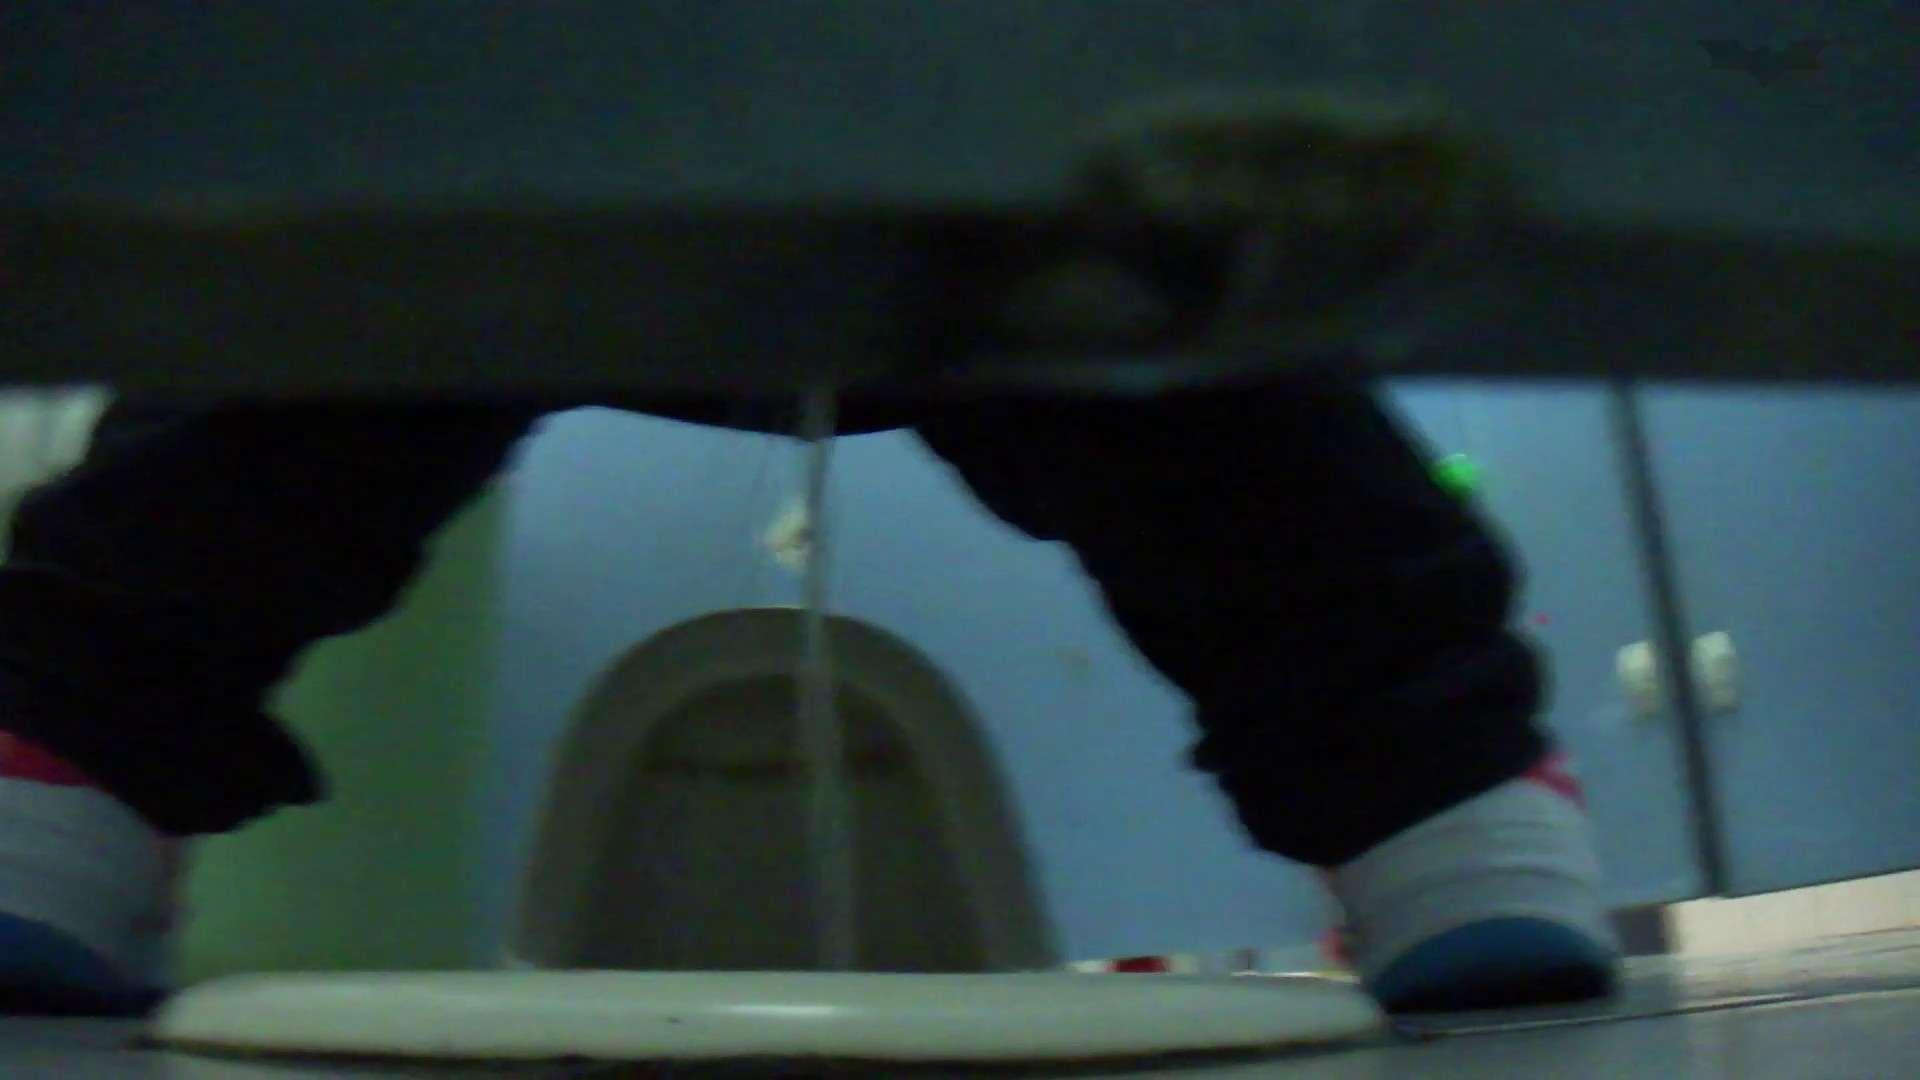 JD盗撮 美女の洗面所の秘密 Vol.76 美肌 オメコ無修正動画無料 99画像 15